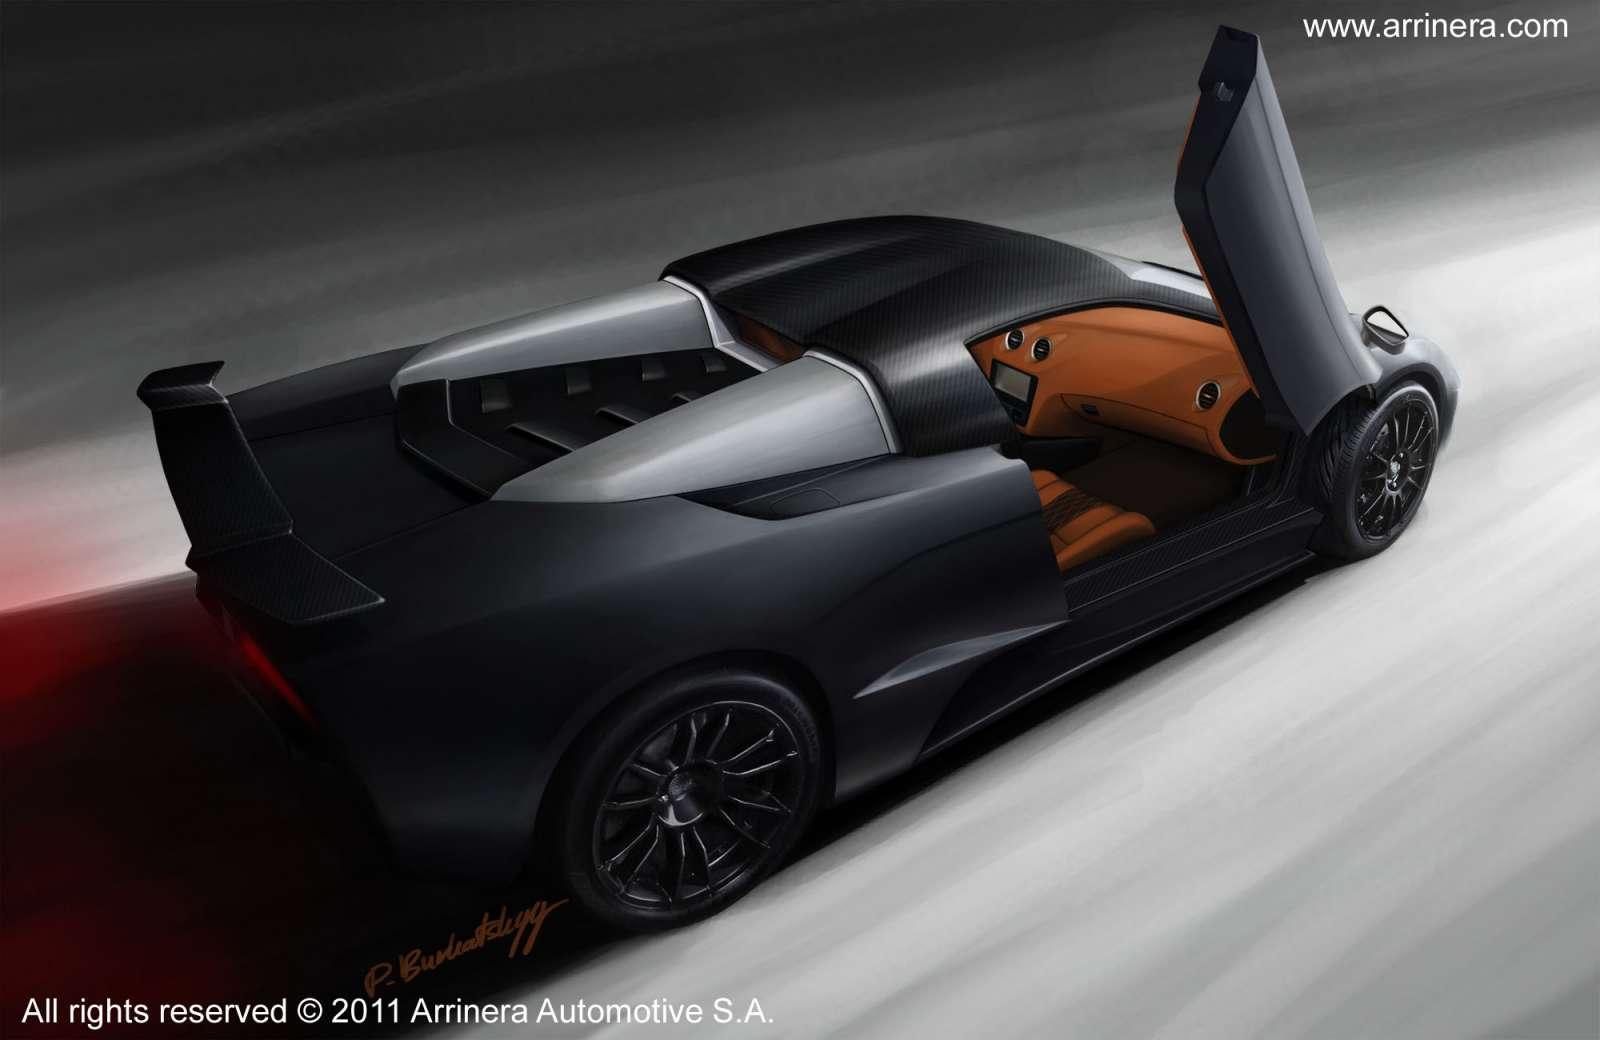 Arrinera Automotive fot producenta maj 2011